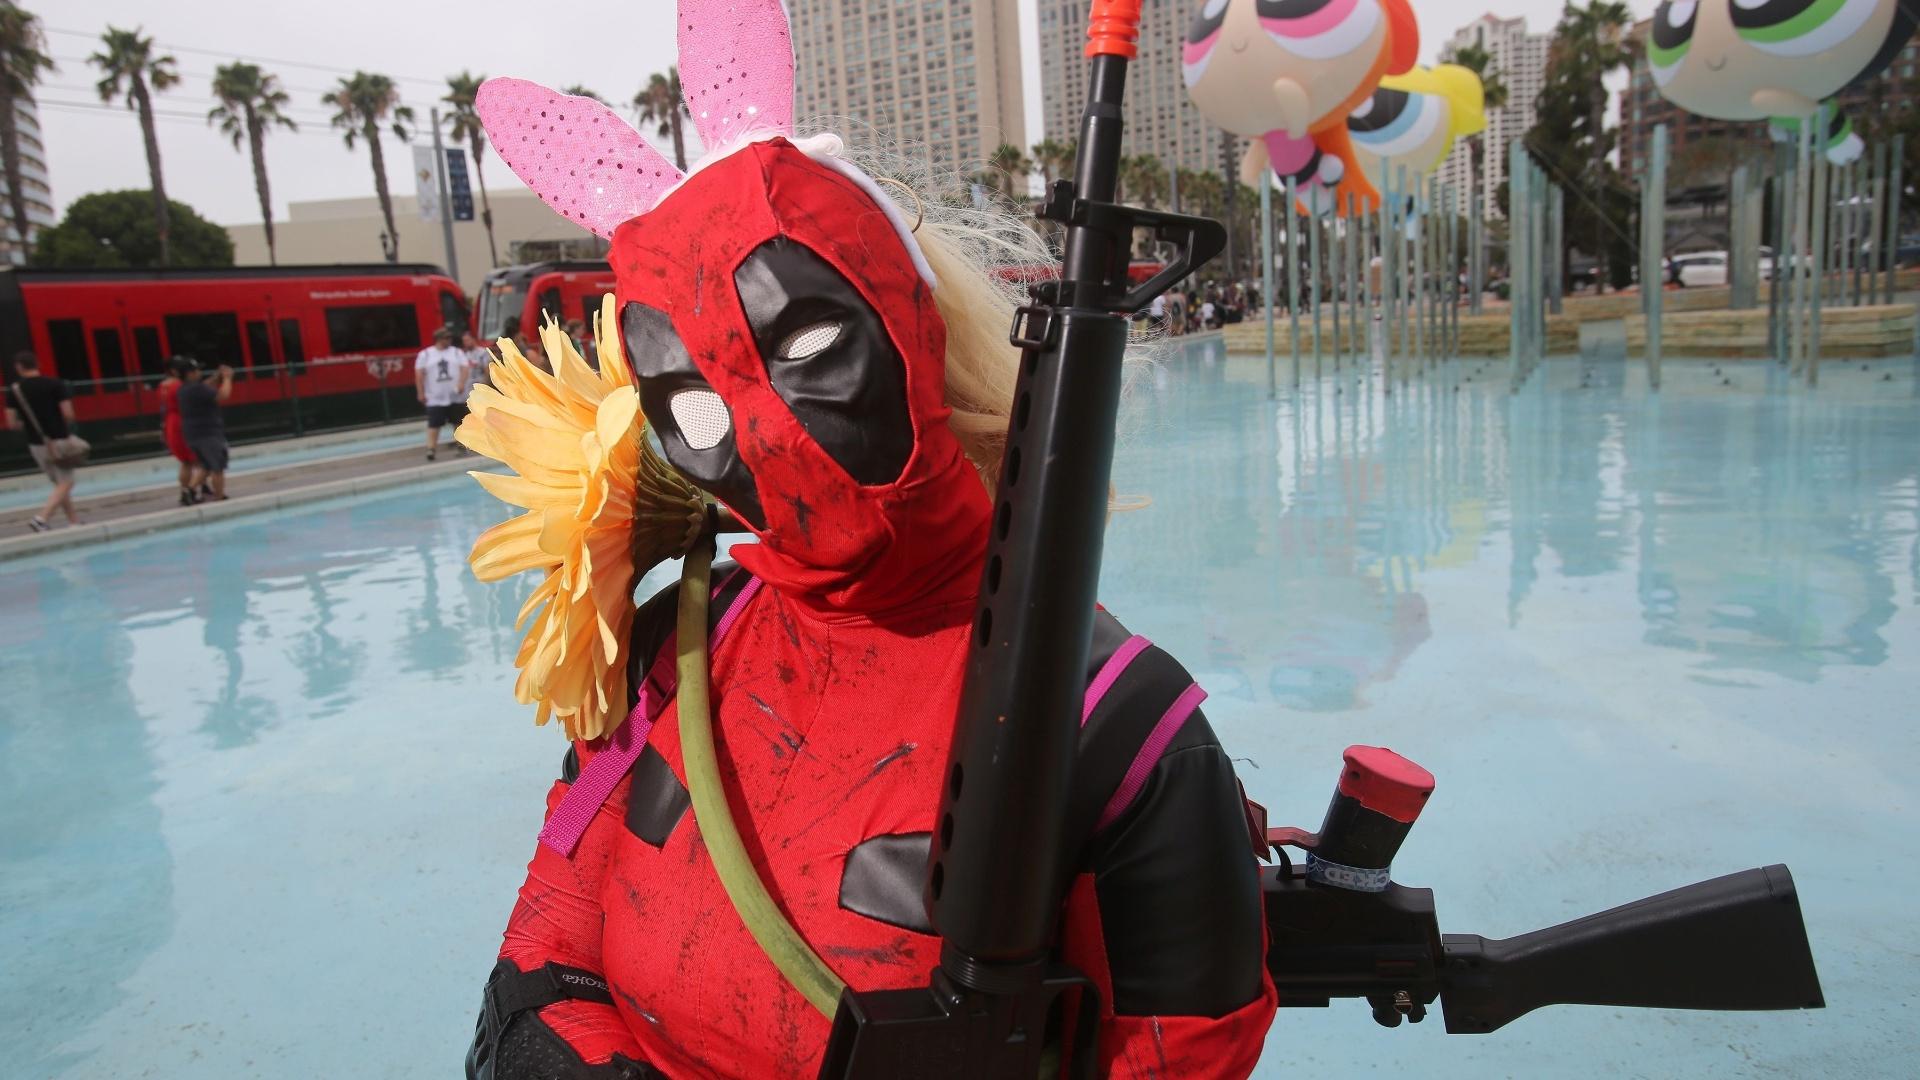 23.jul.2016 - Anna Smith adicionou adereços fofos a sua versão feminina do anti-herói Deadpool para a San Diego Comic-Con 2016